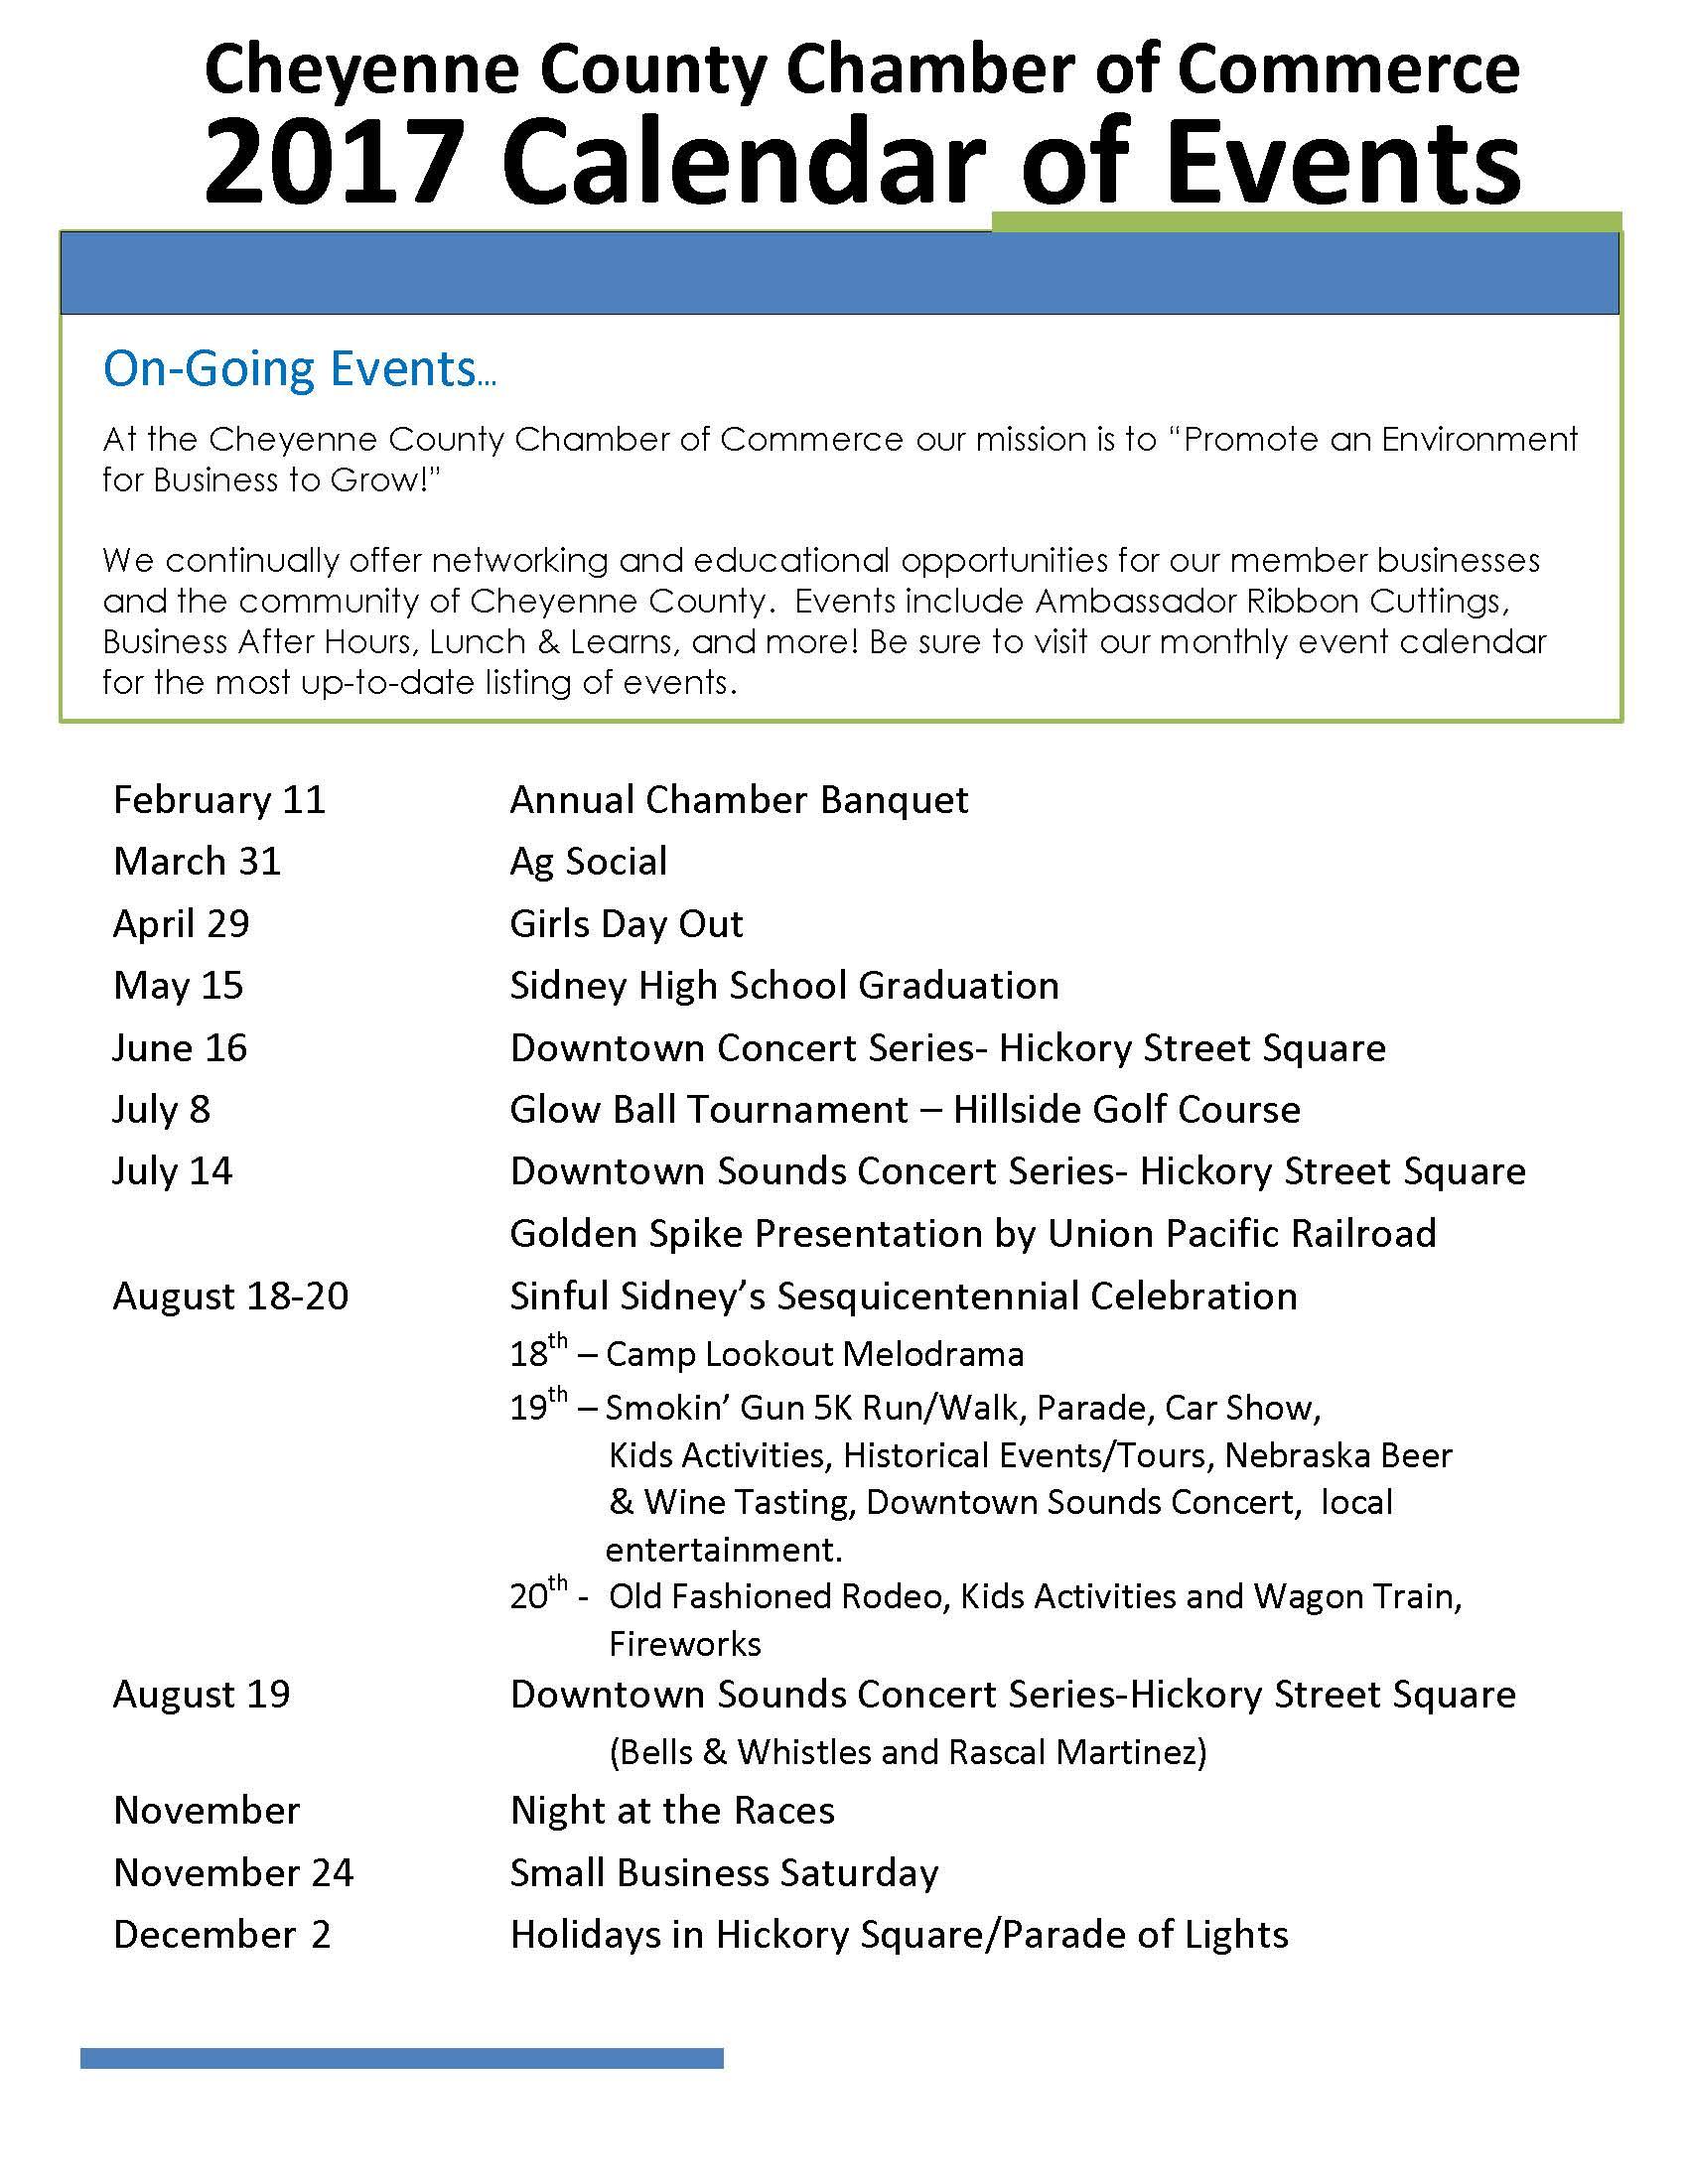 Calendar-of-Events-2017.jpg